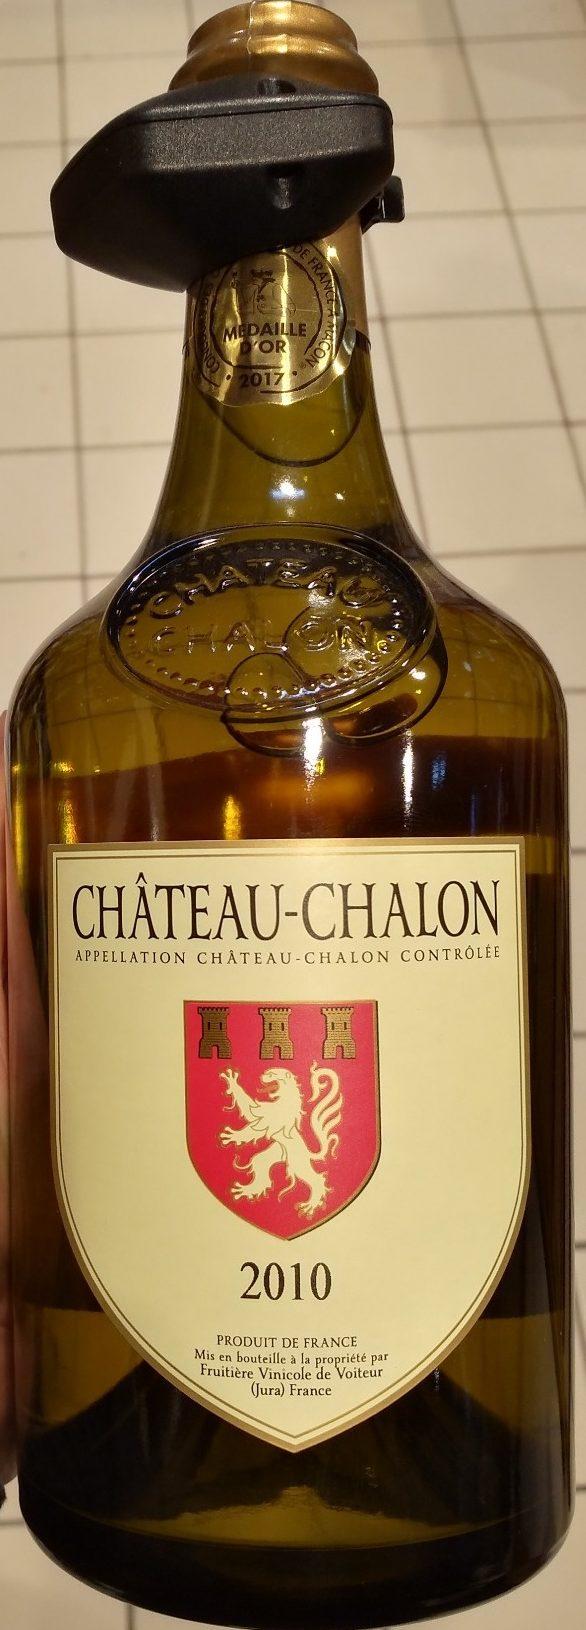 Château-Chalon - Product - fr